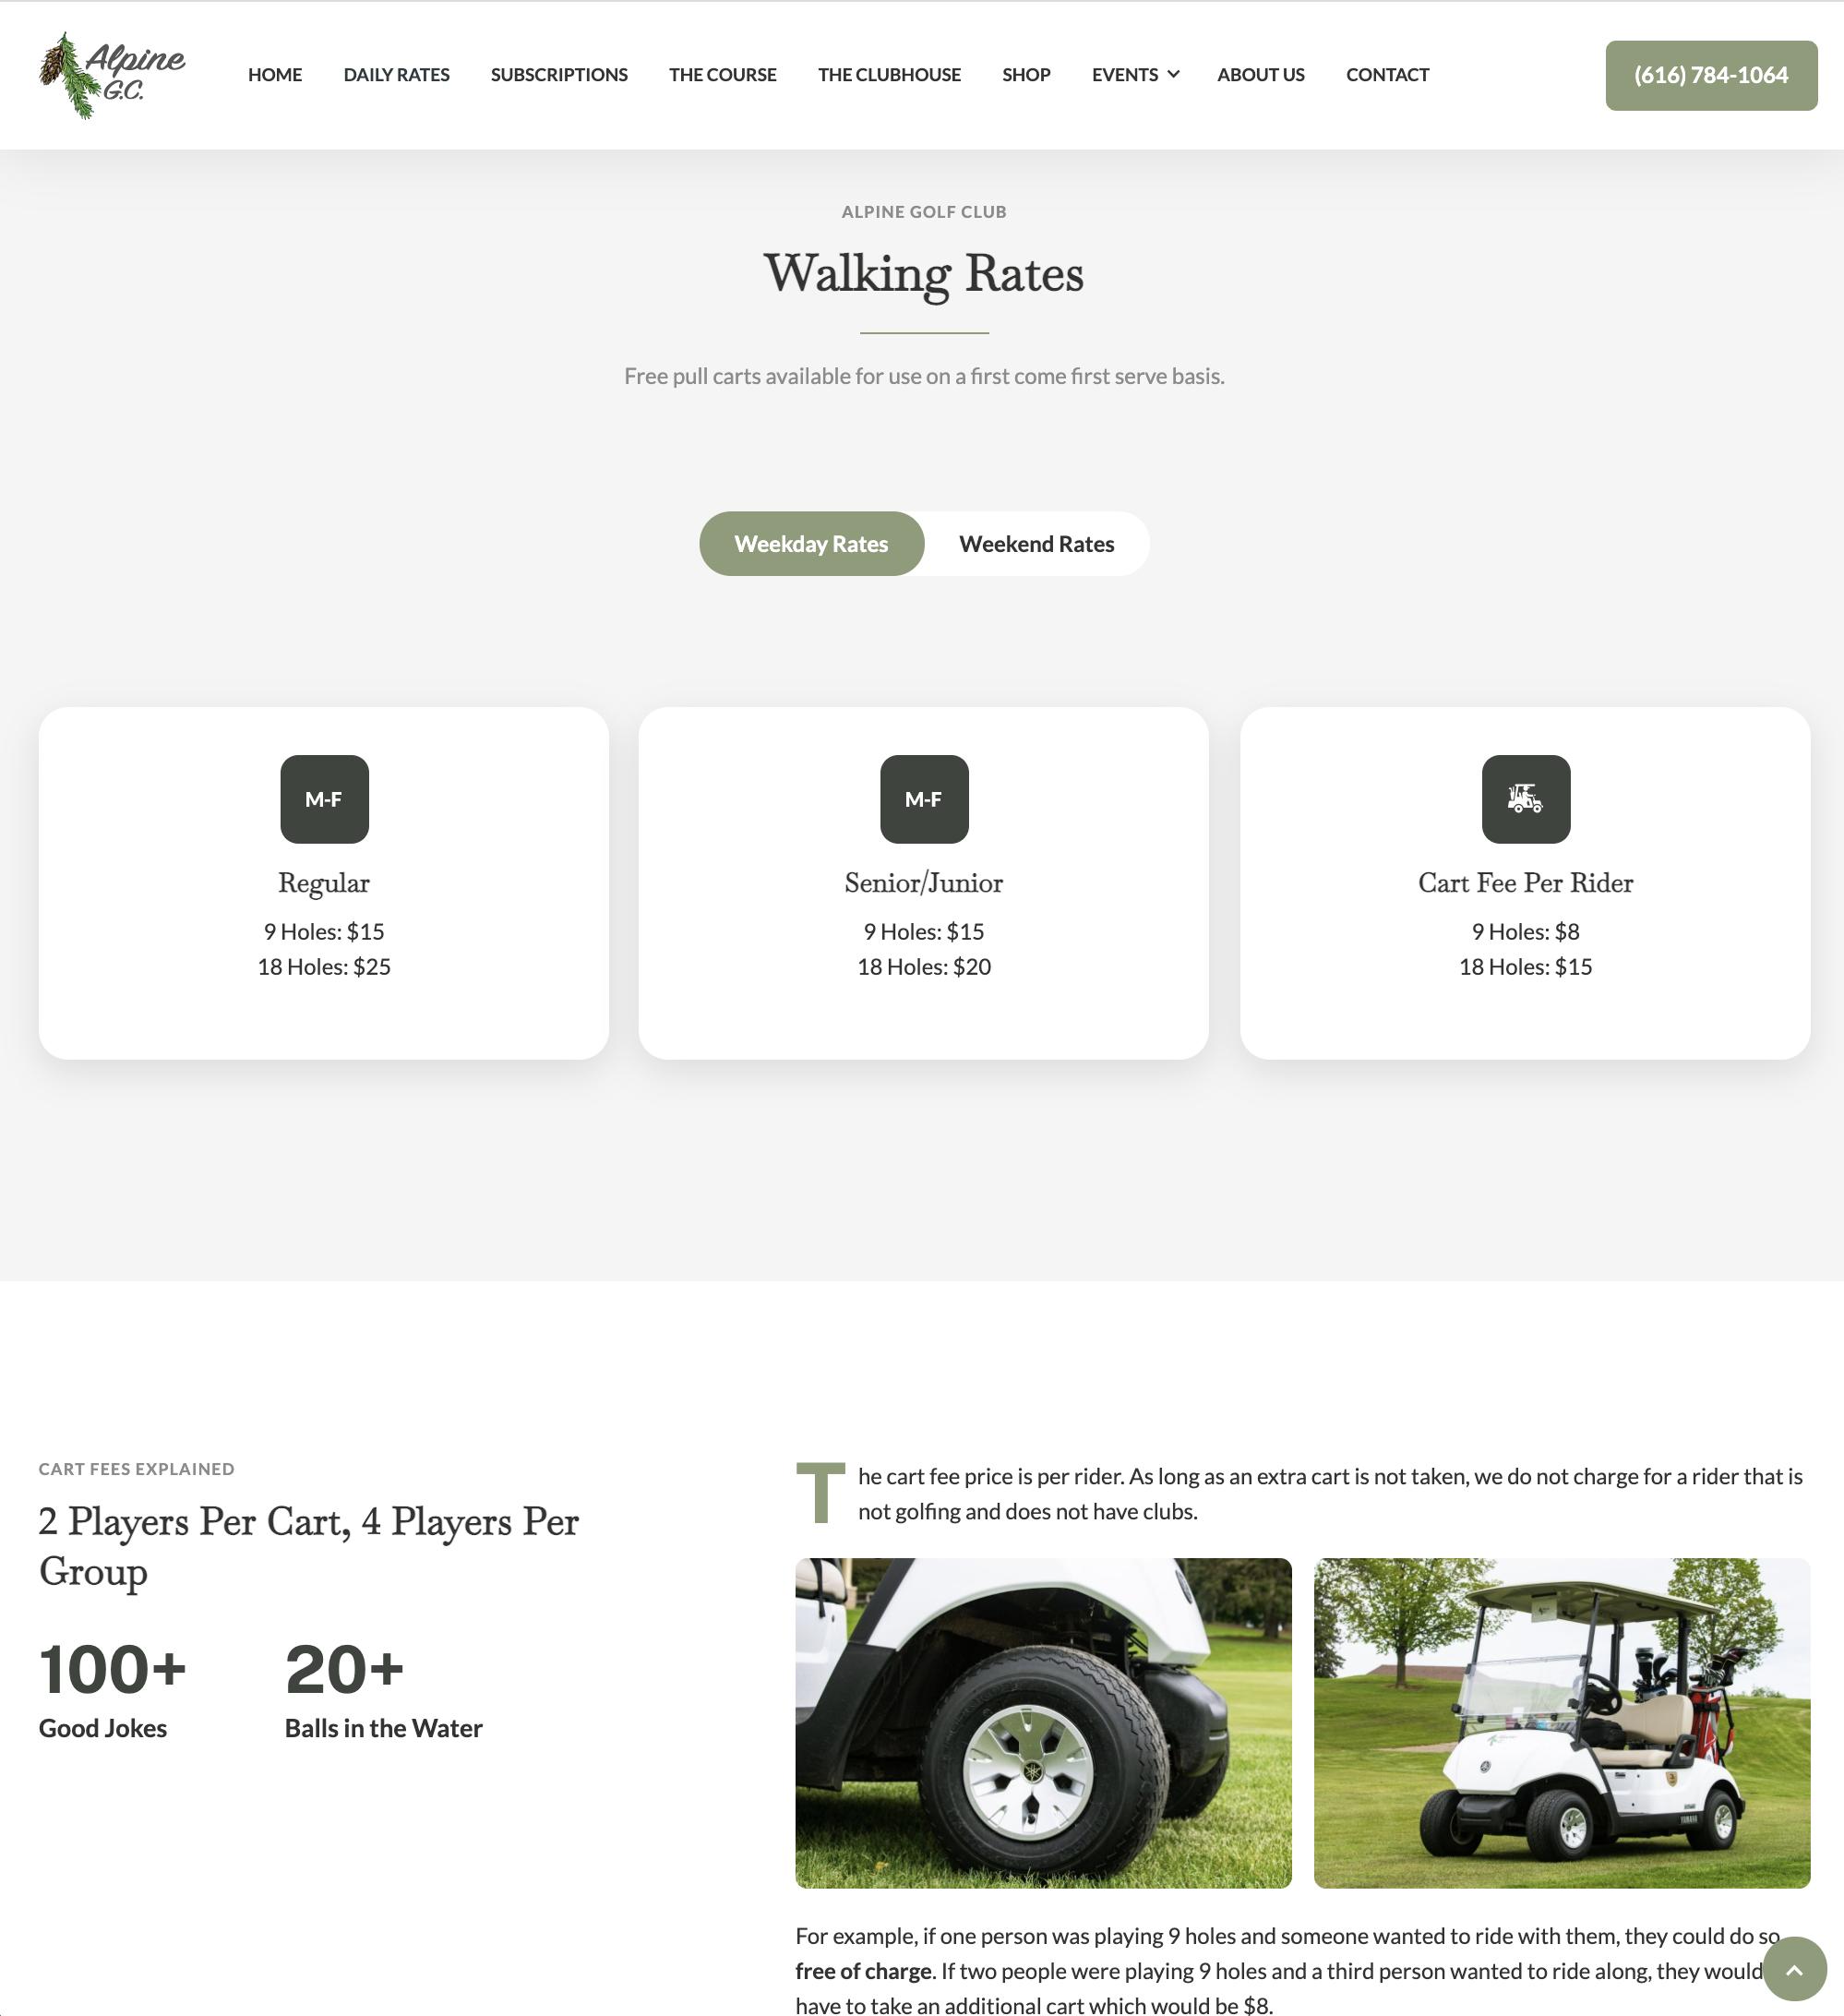 Alpine Golf Club Website Design